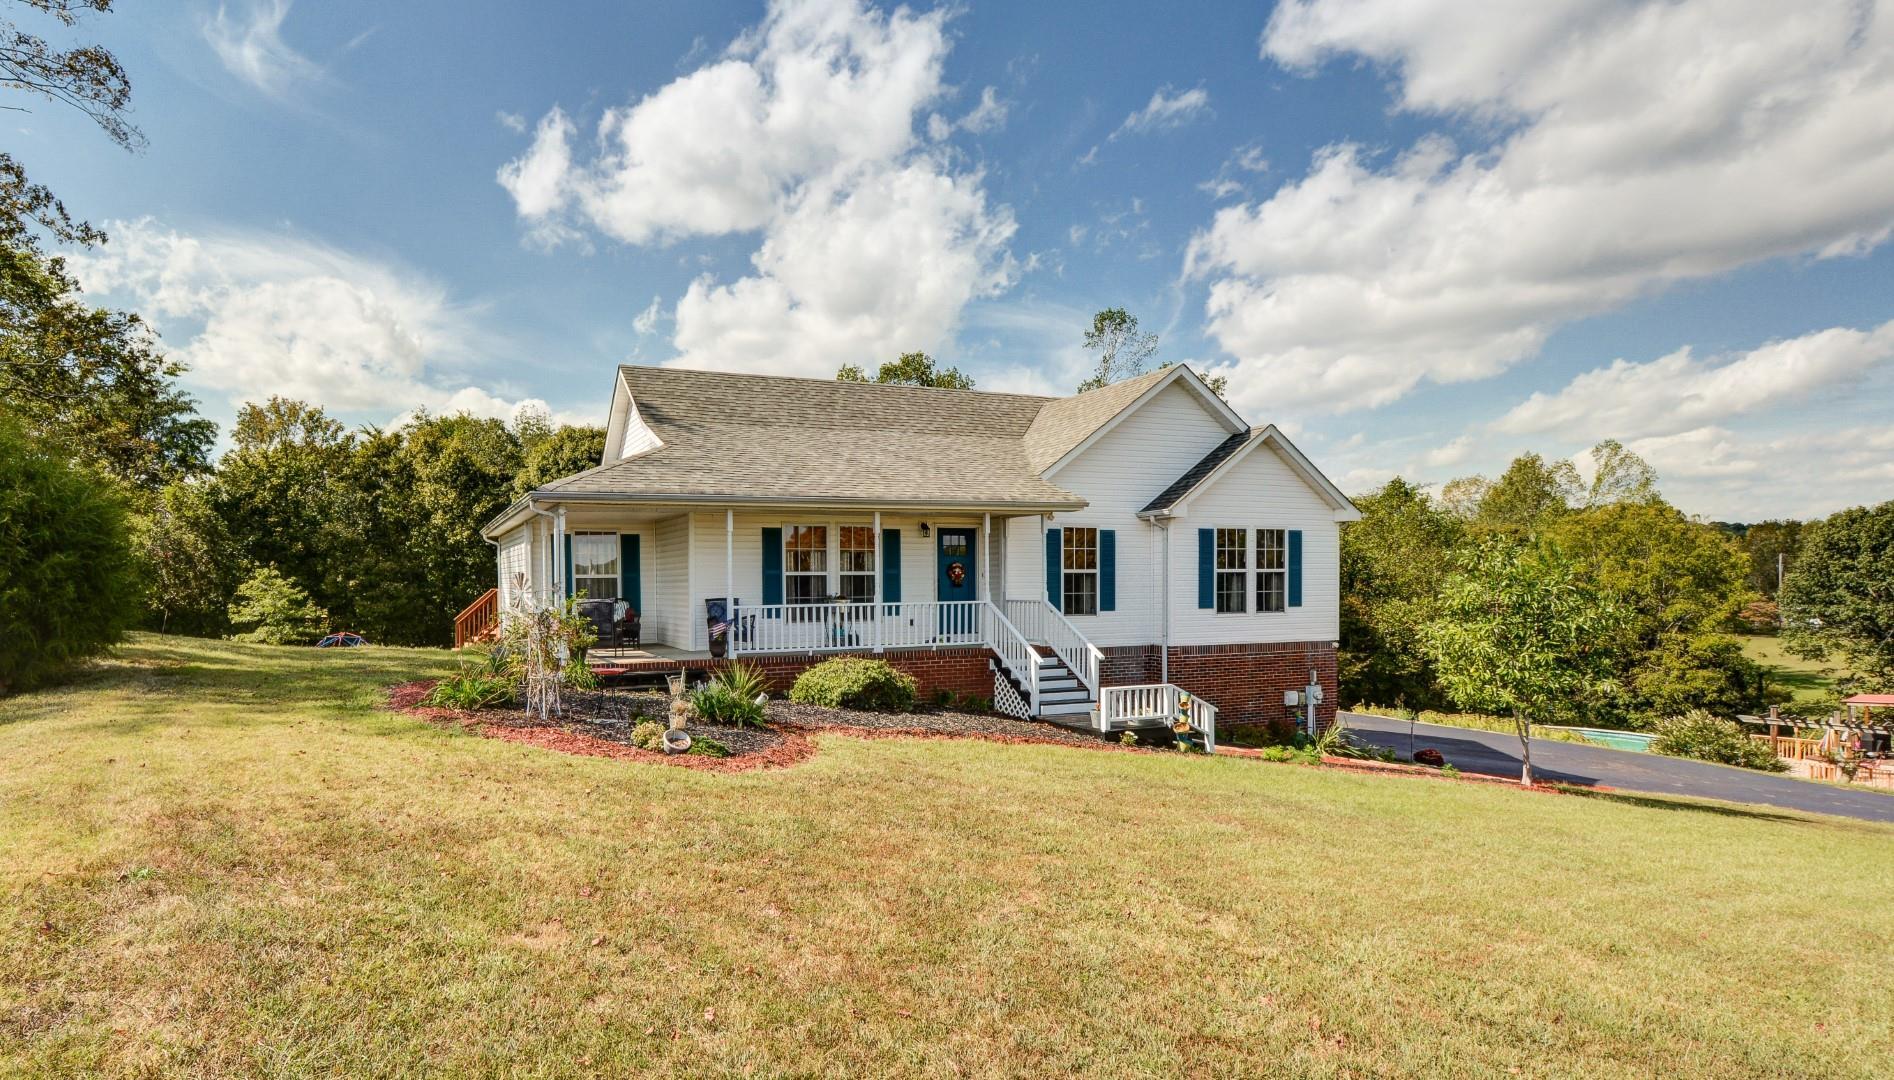 1202 Chapmansboro Rd, Chapmansboro, TN 37035 - Chapmansboro, TN real estate listing